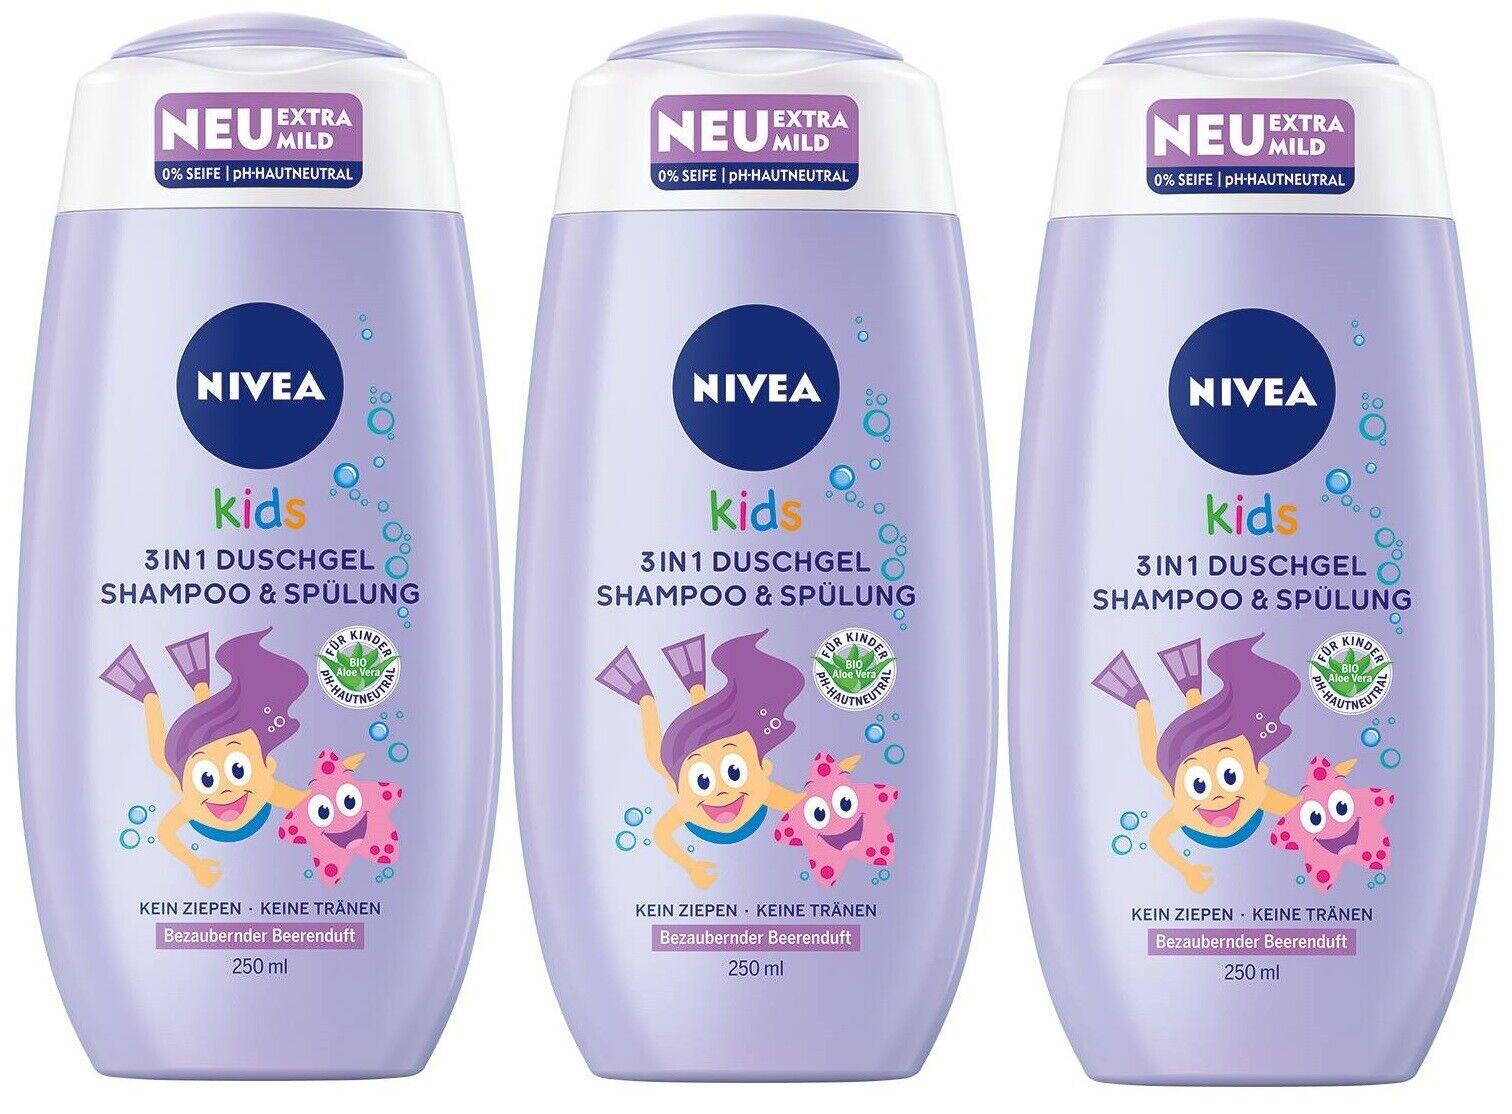 Nivea Kids 3in1 Duschgel & Shampoo Beerenduft ph-Neutral 01er-Pack(1x250ml)